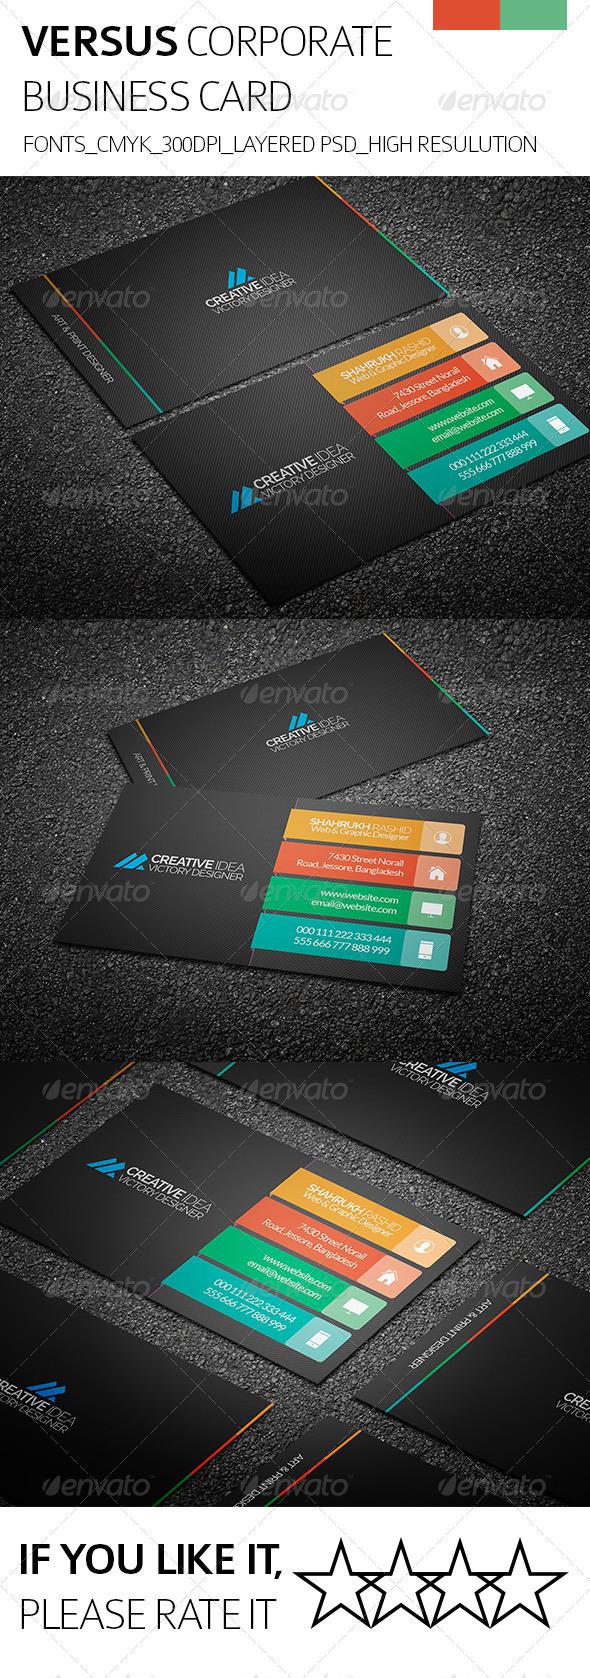 Versus & Corporate Business Card - Corporate Business Cards